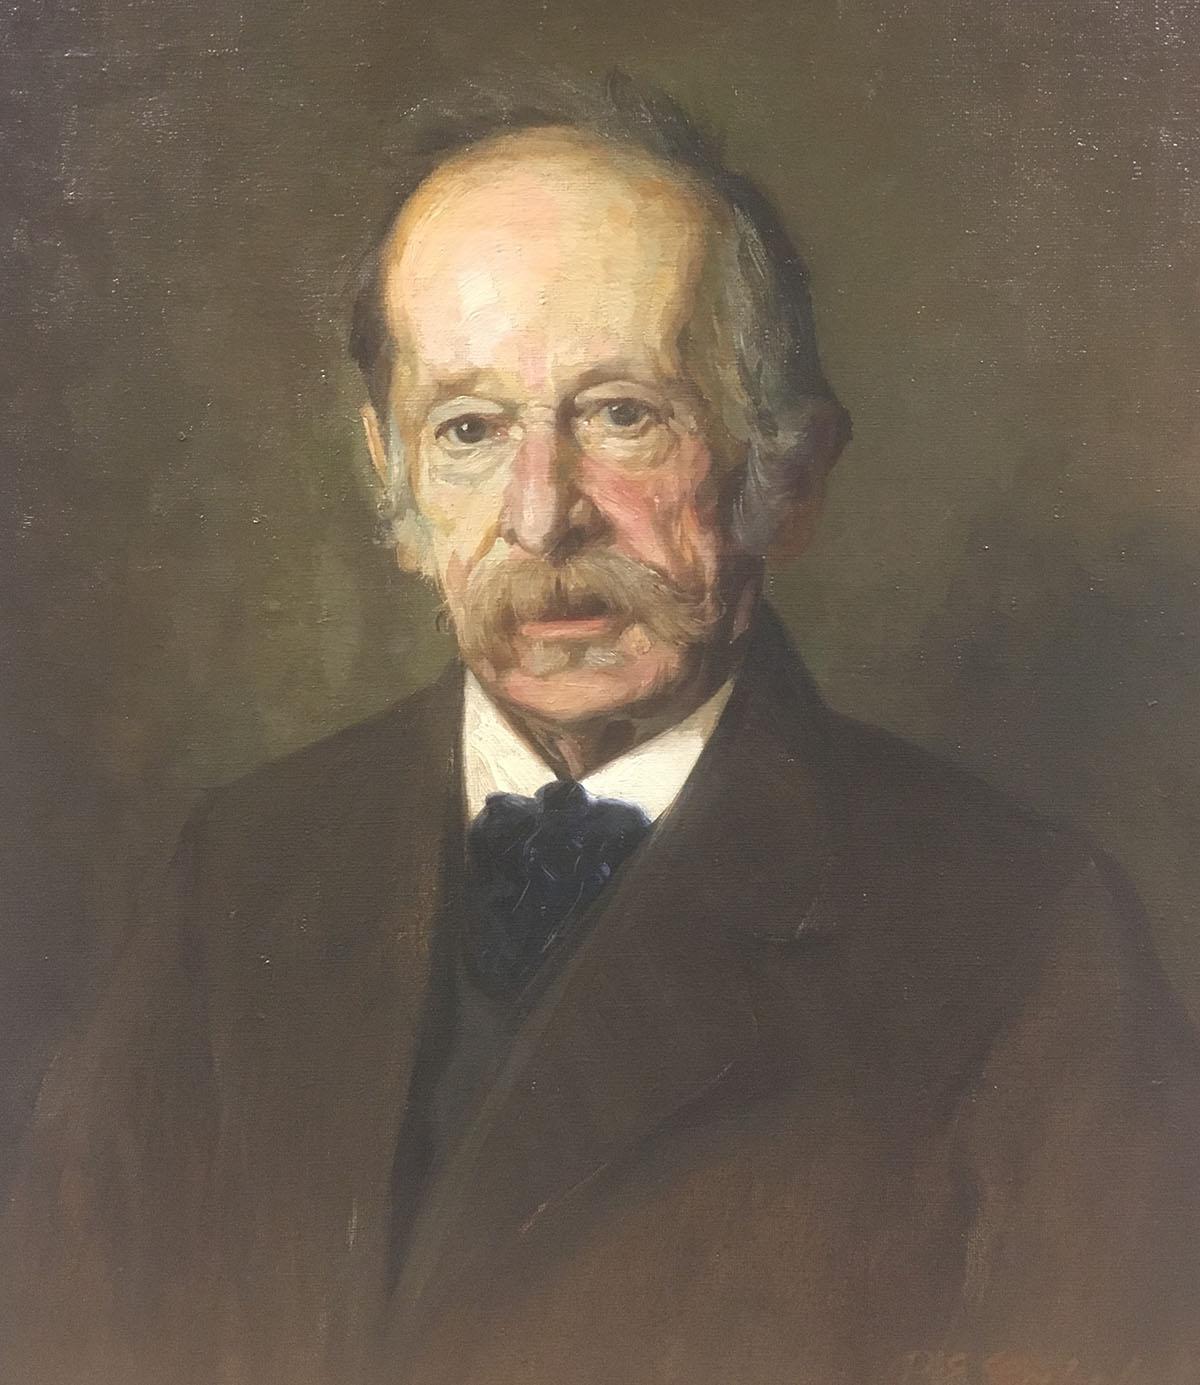 Prof. Dr. Friedrich Giesel